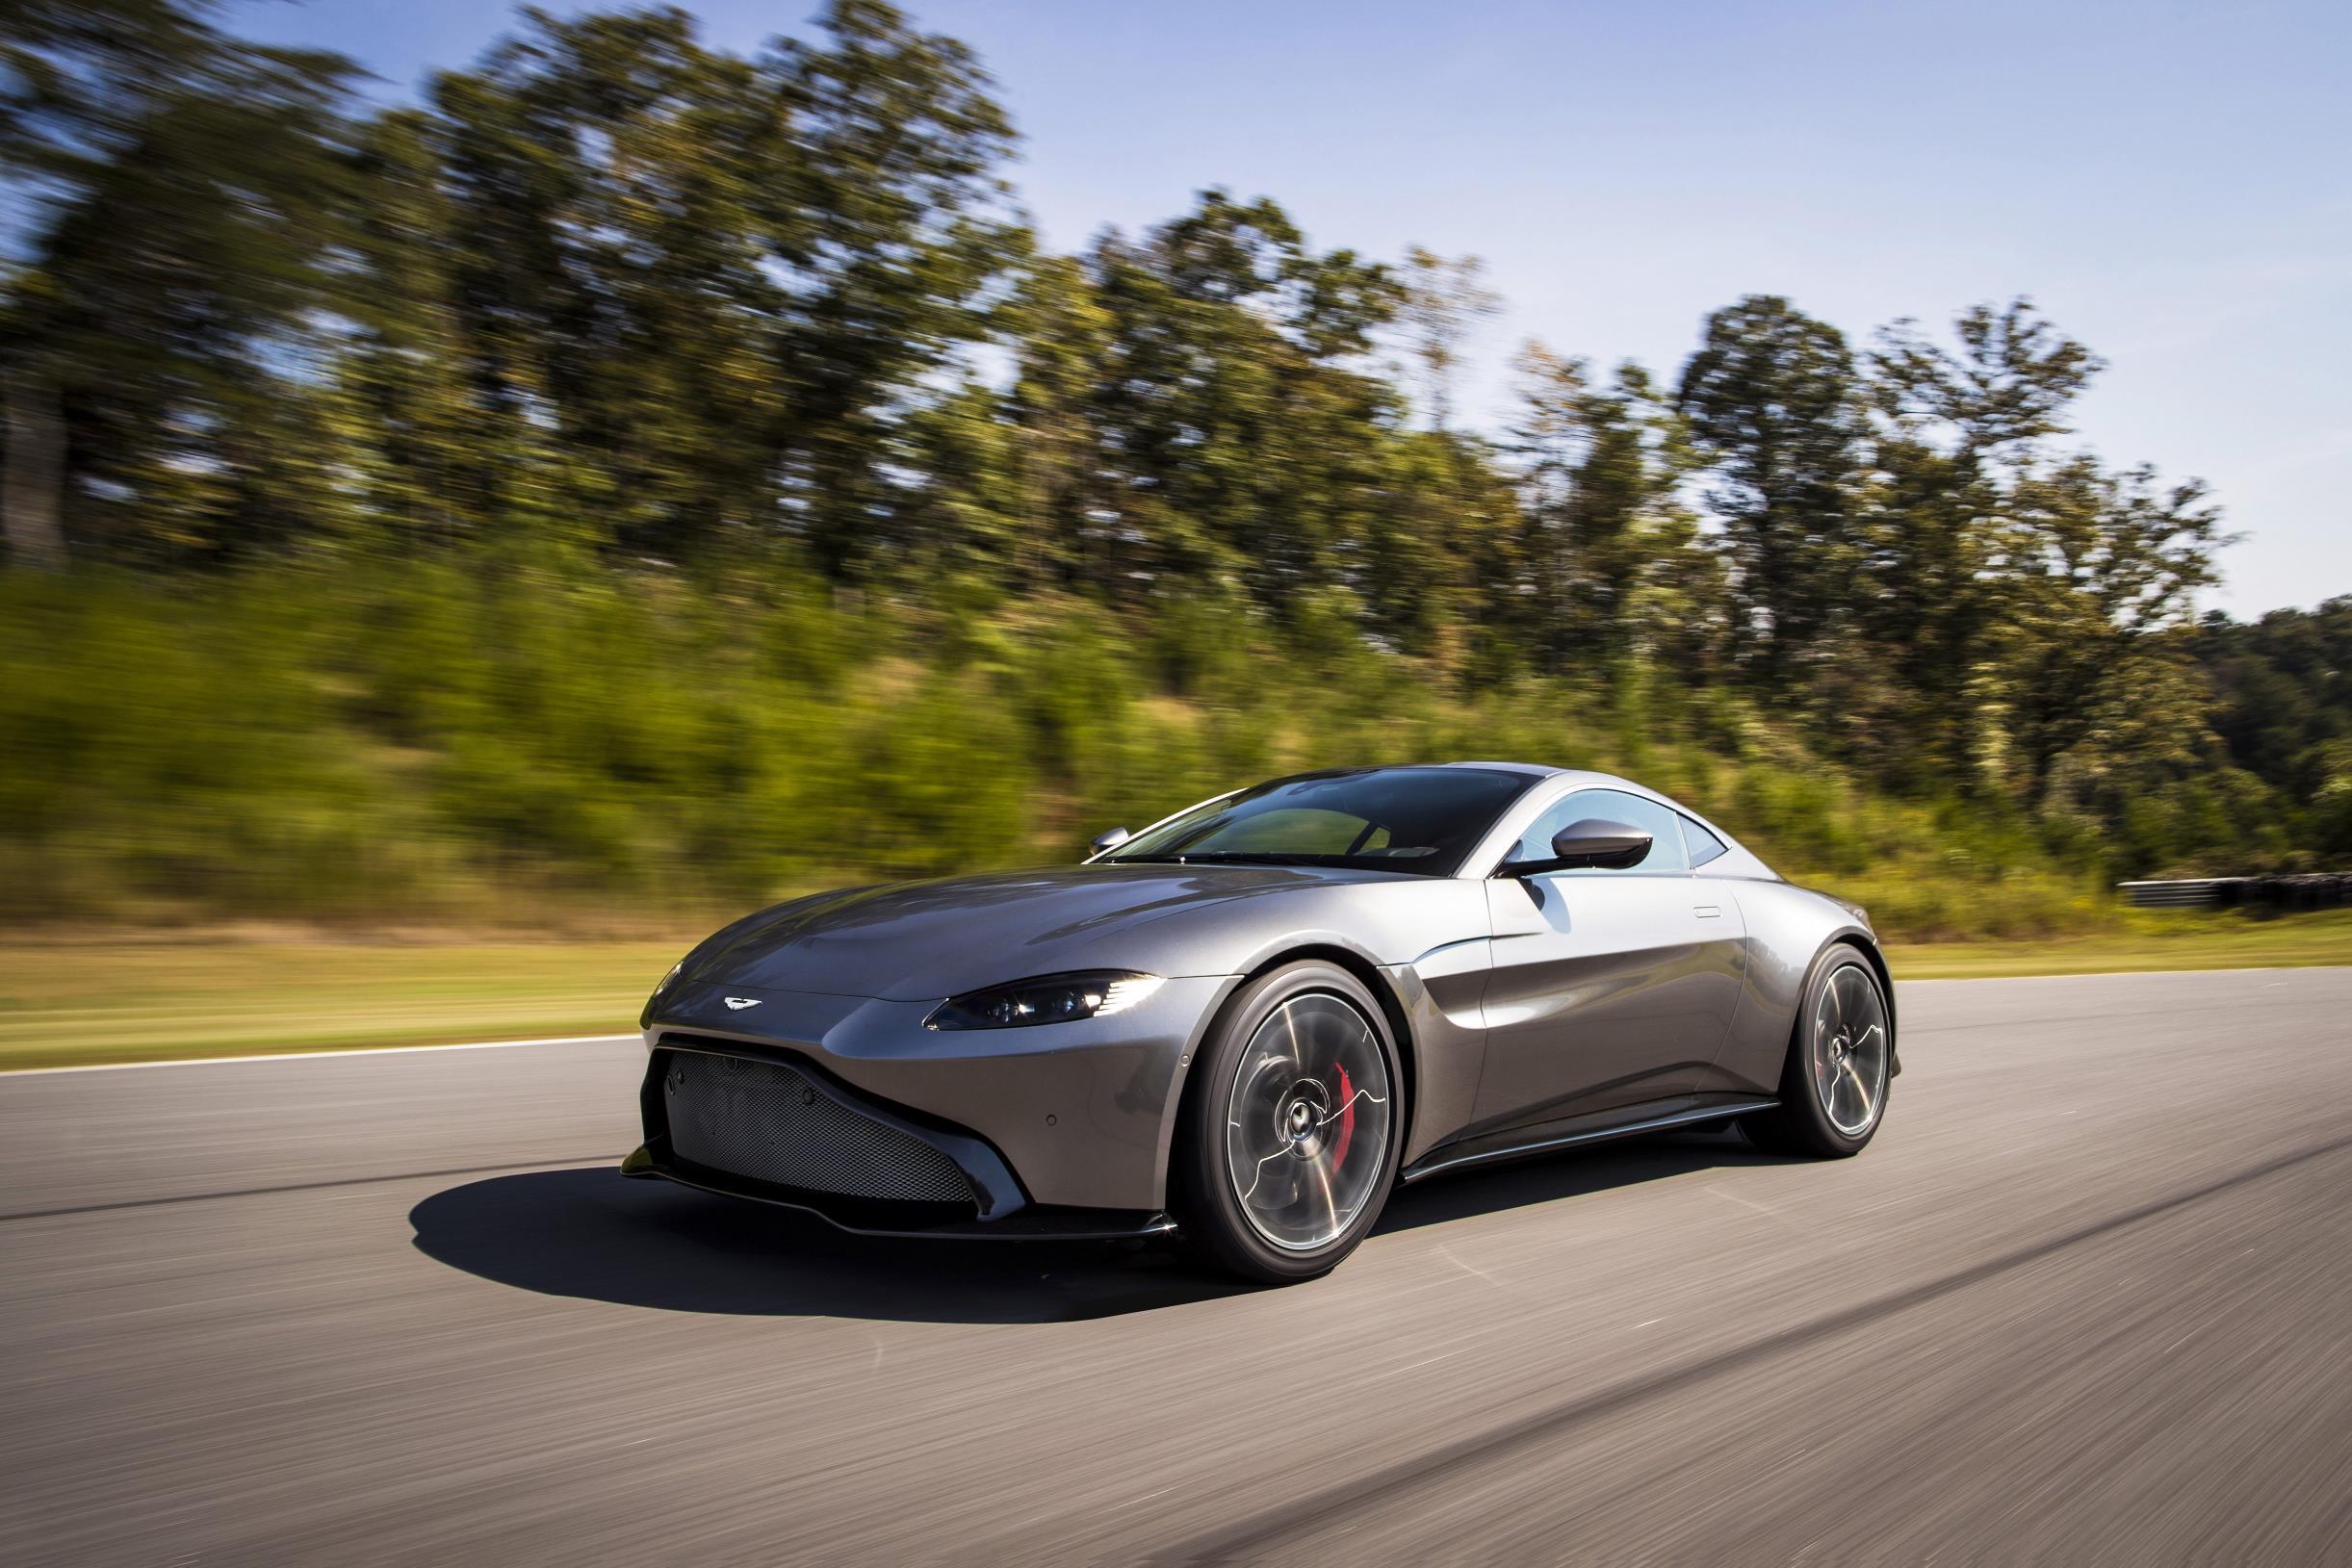 2018 Aston Martin Vantage Grey Driving Top10cars